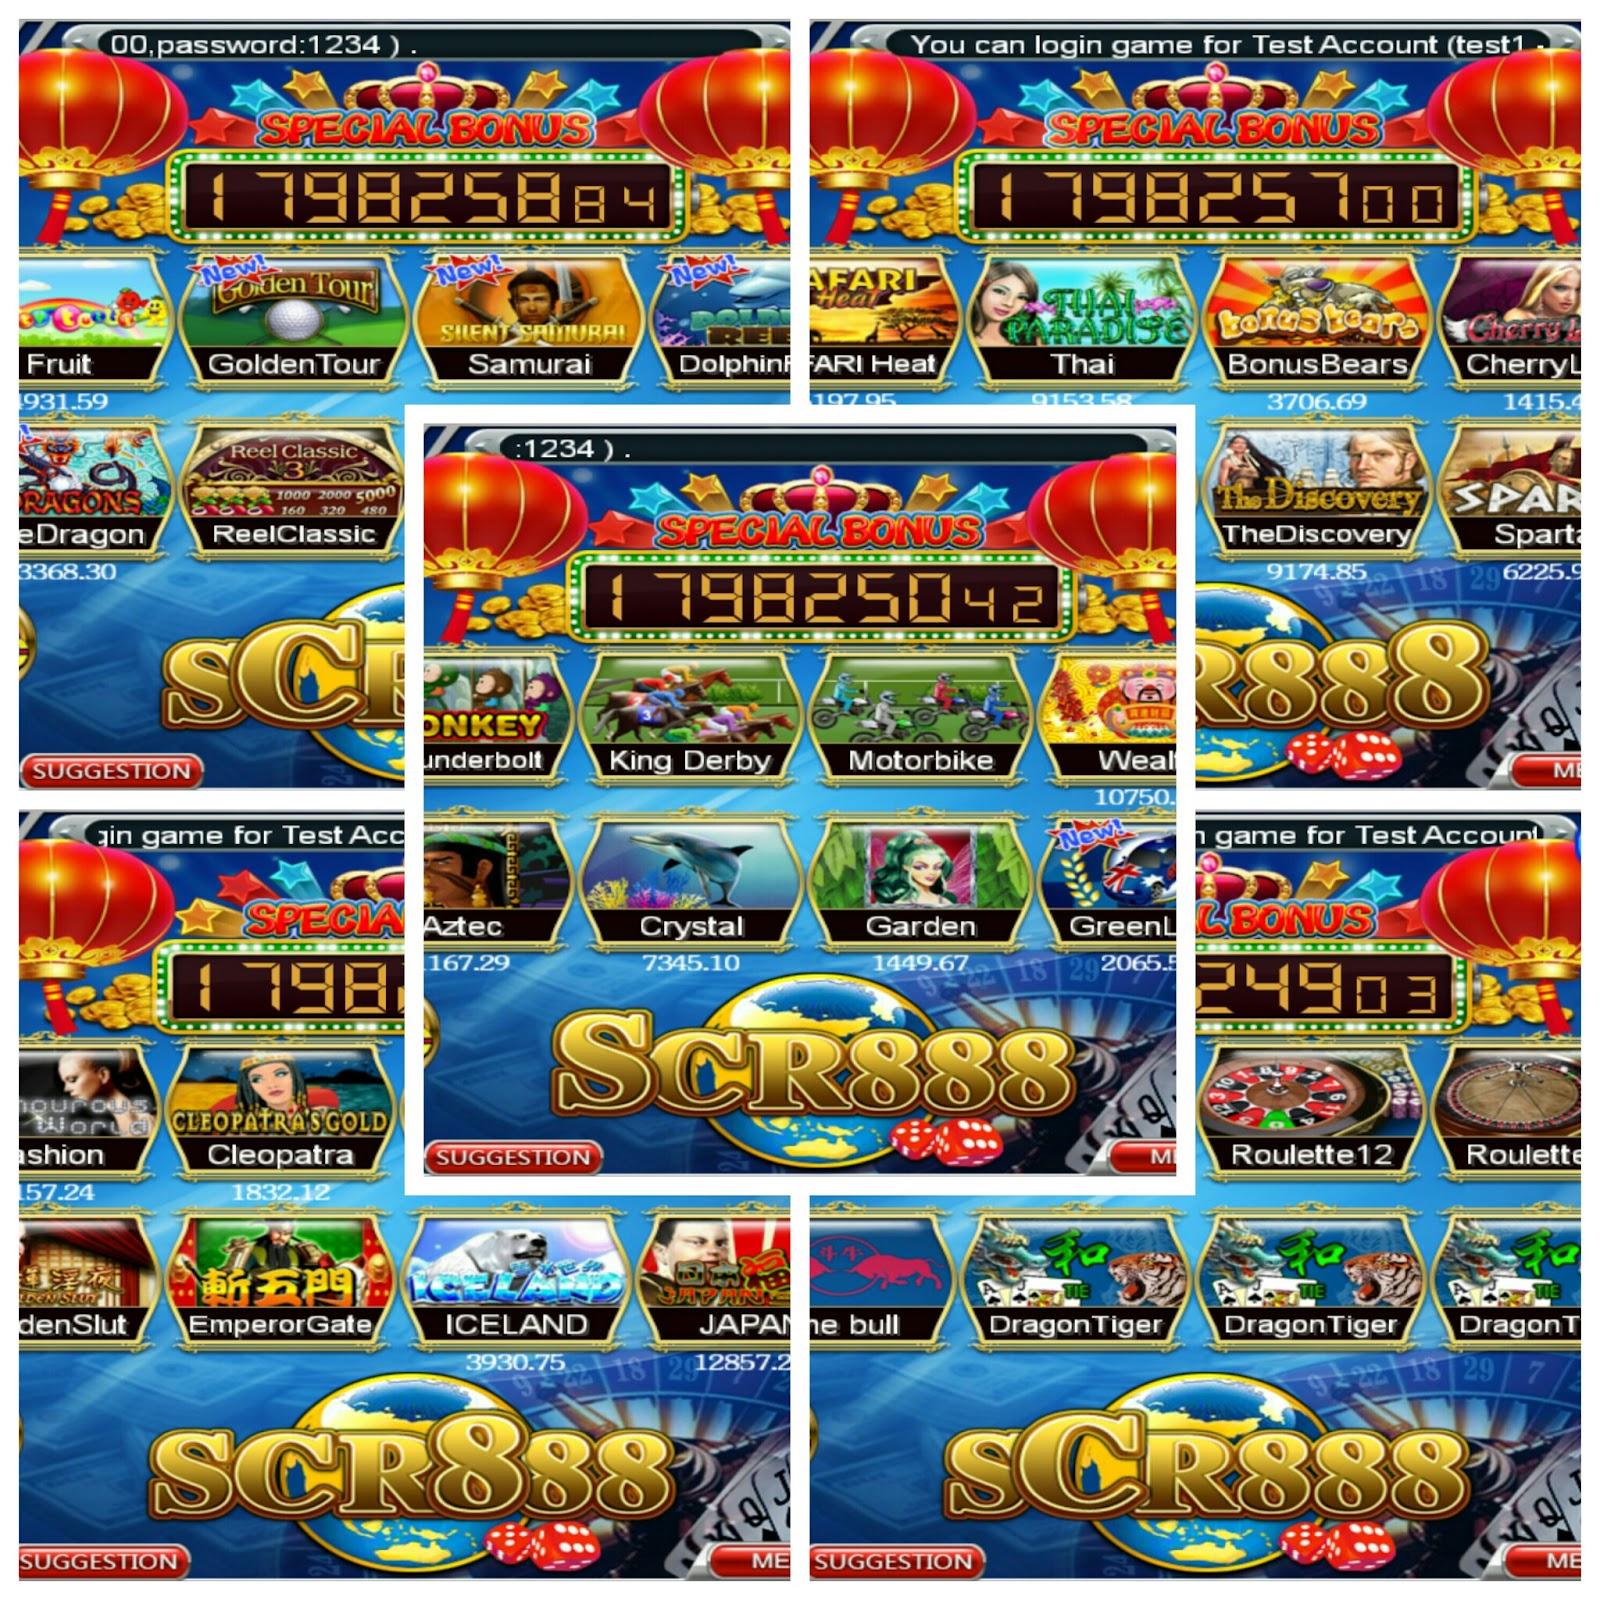 slot games | Euro Palace Casino Blog - Part 3